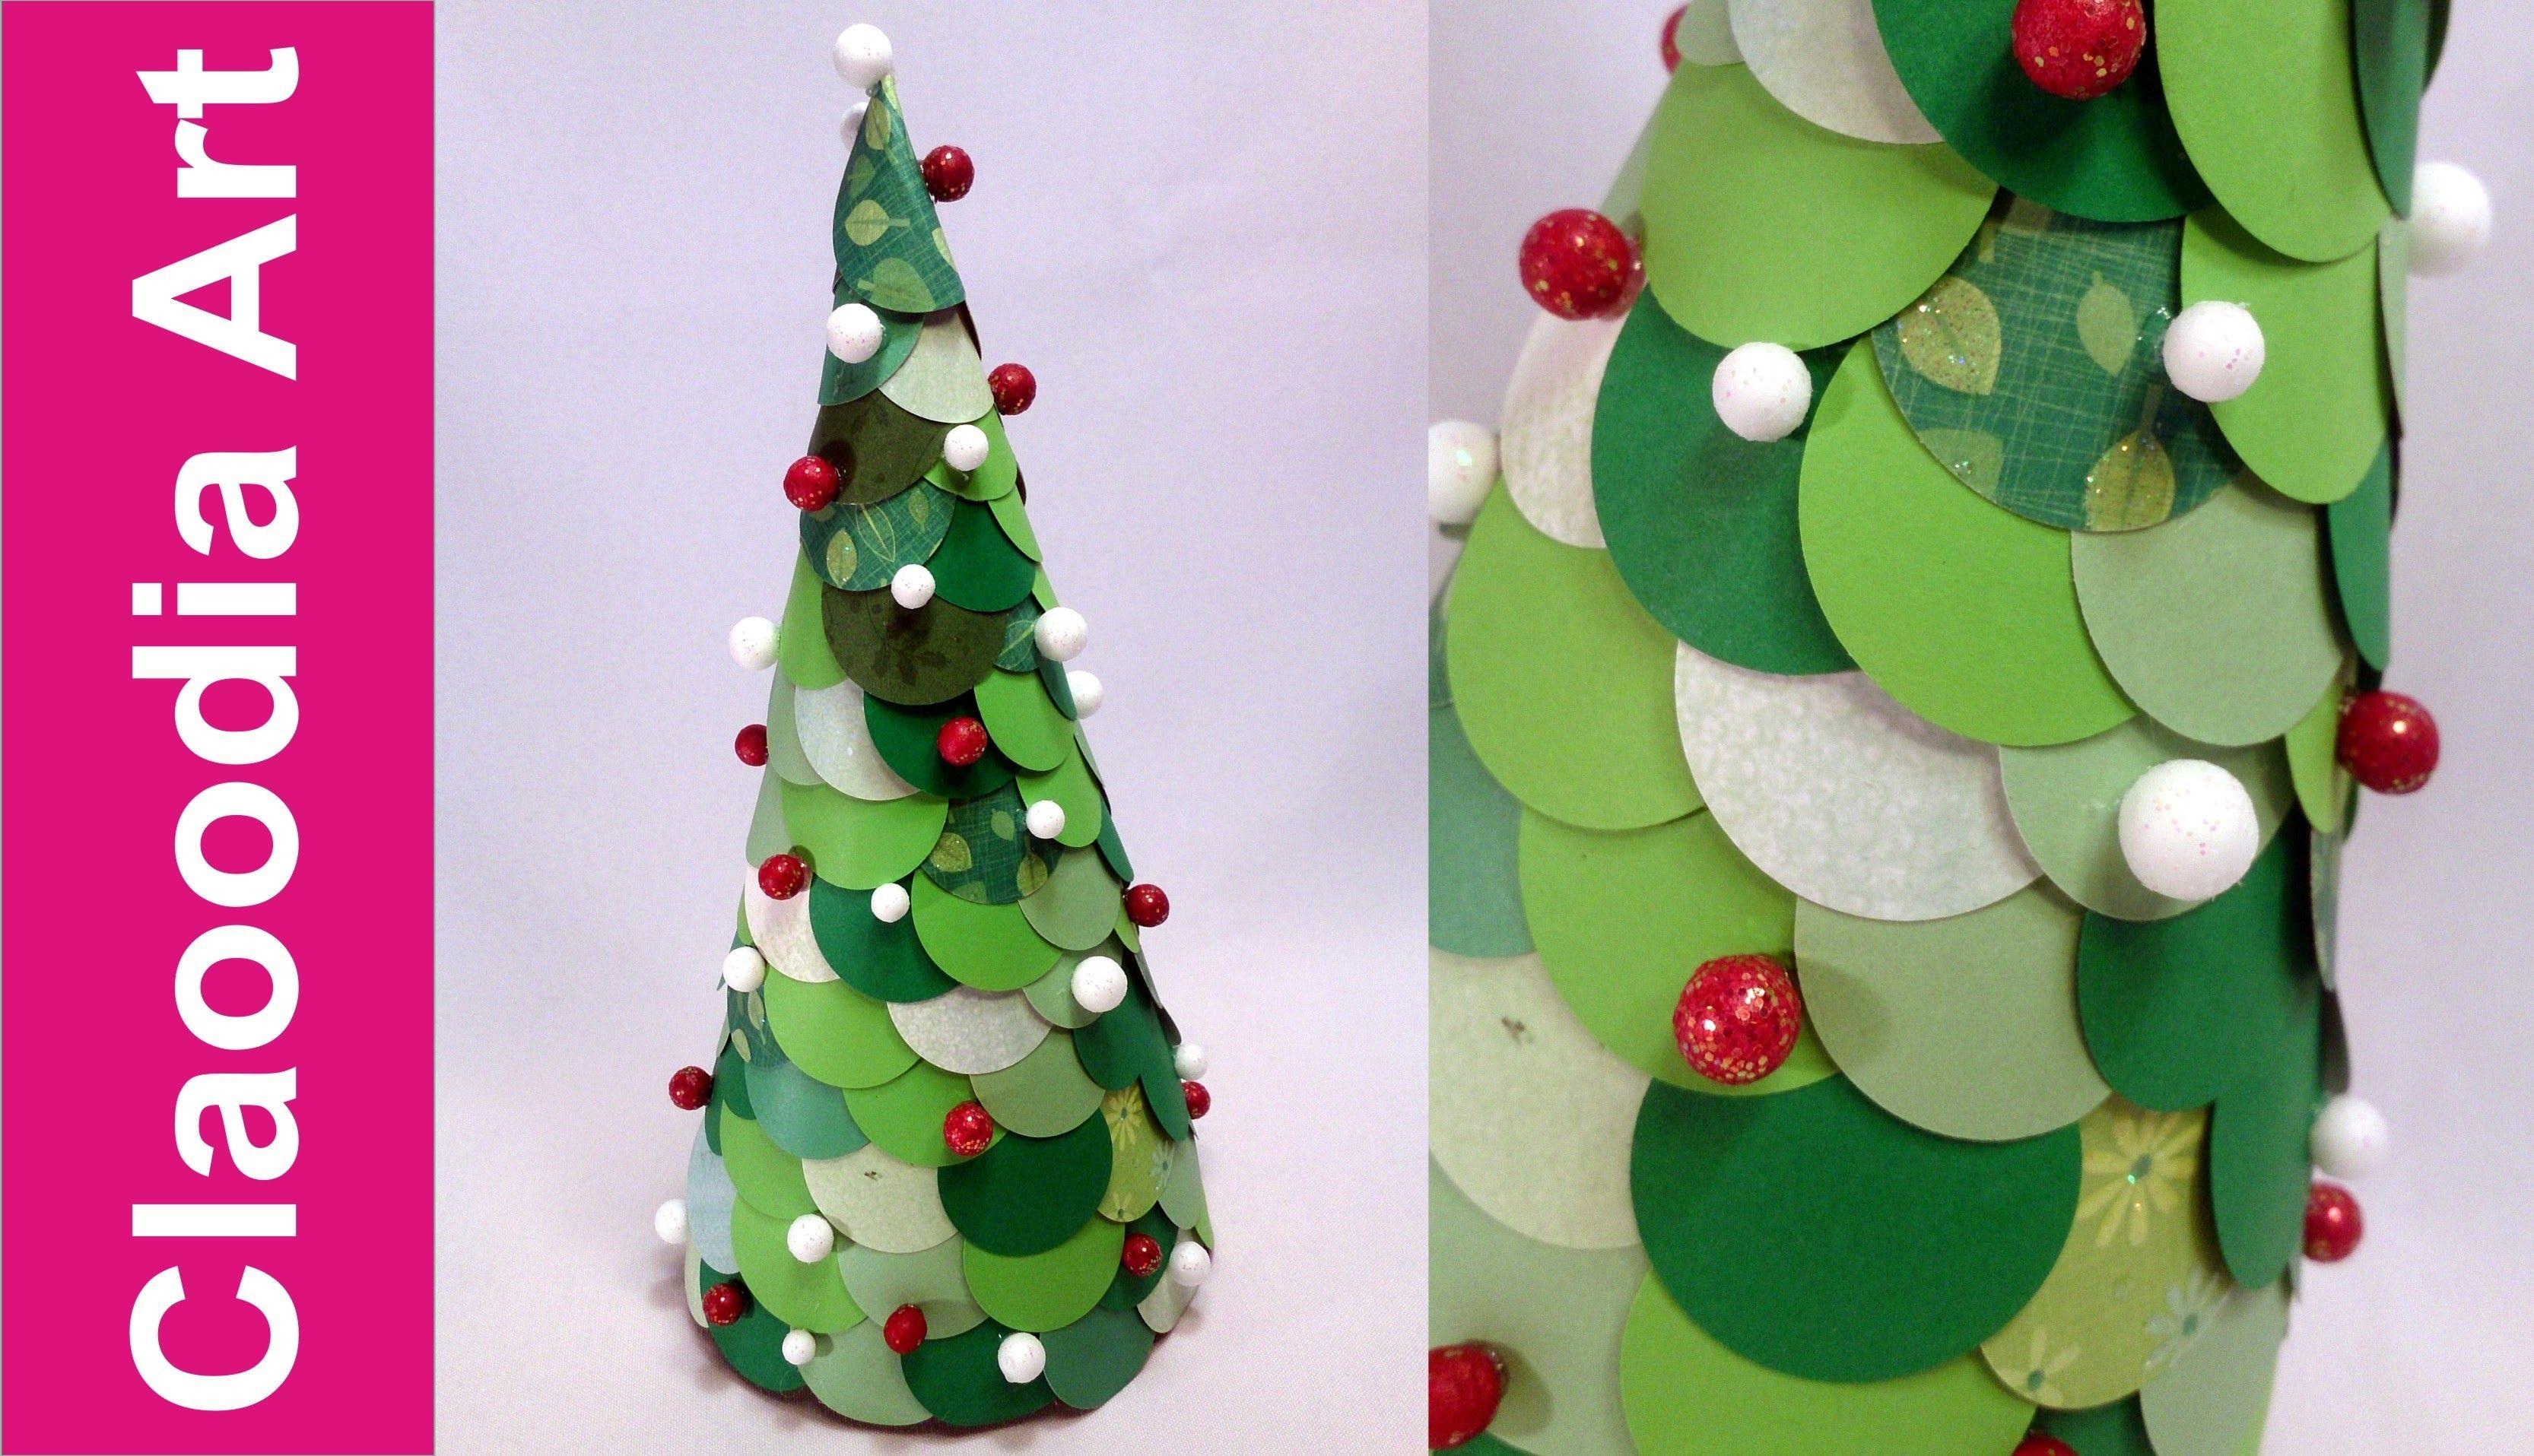 Choinka Z K Ek Z Papieru (Paper Christmas Tree)